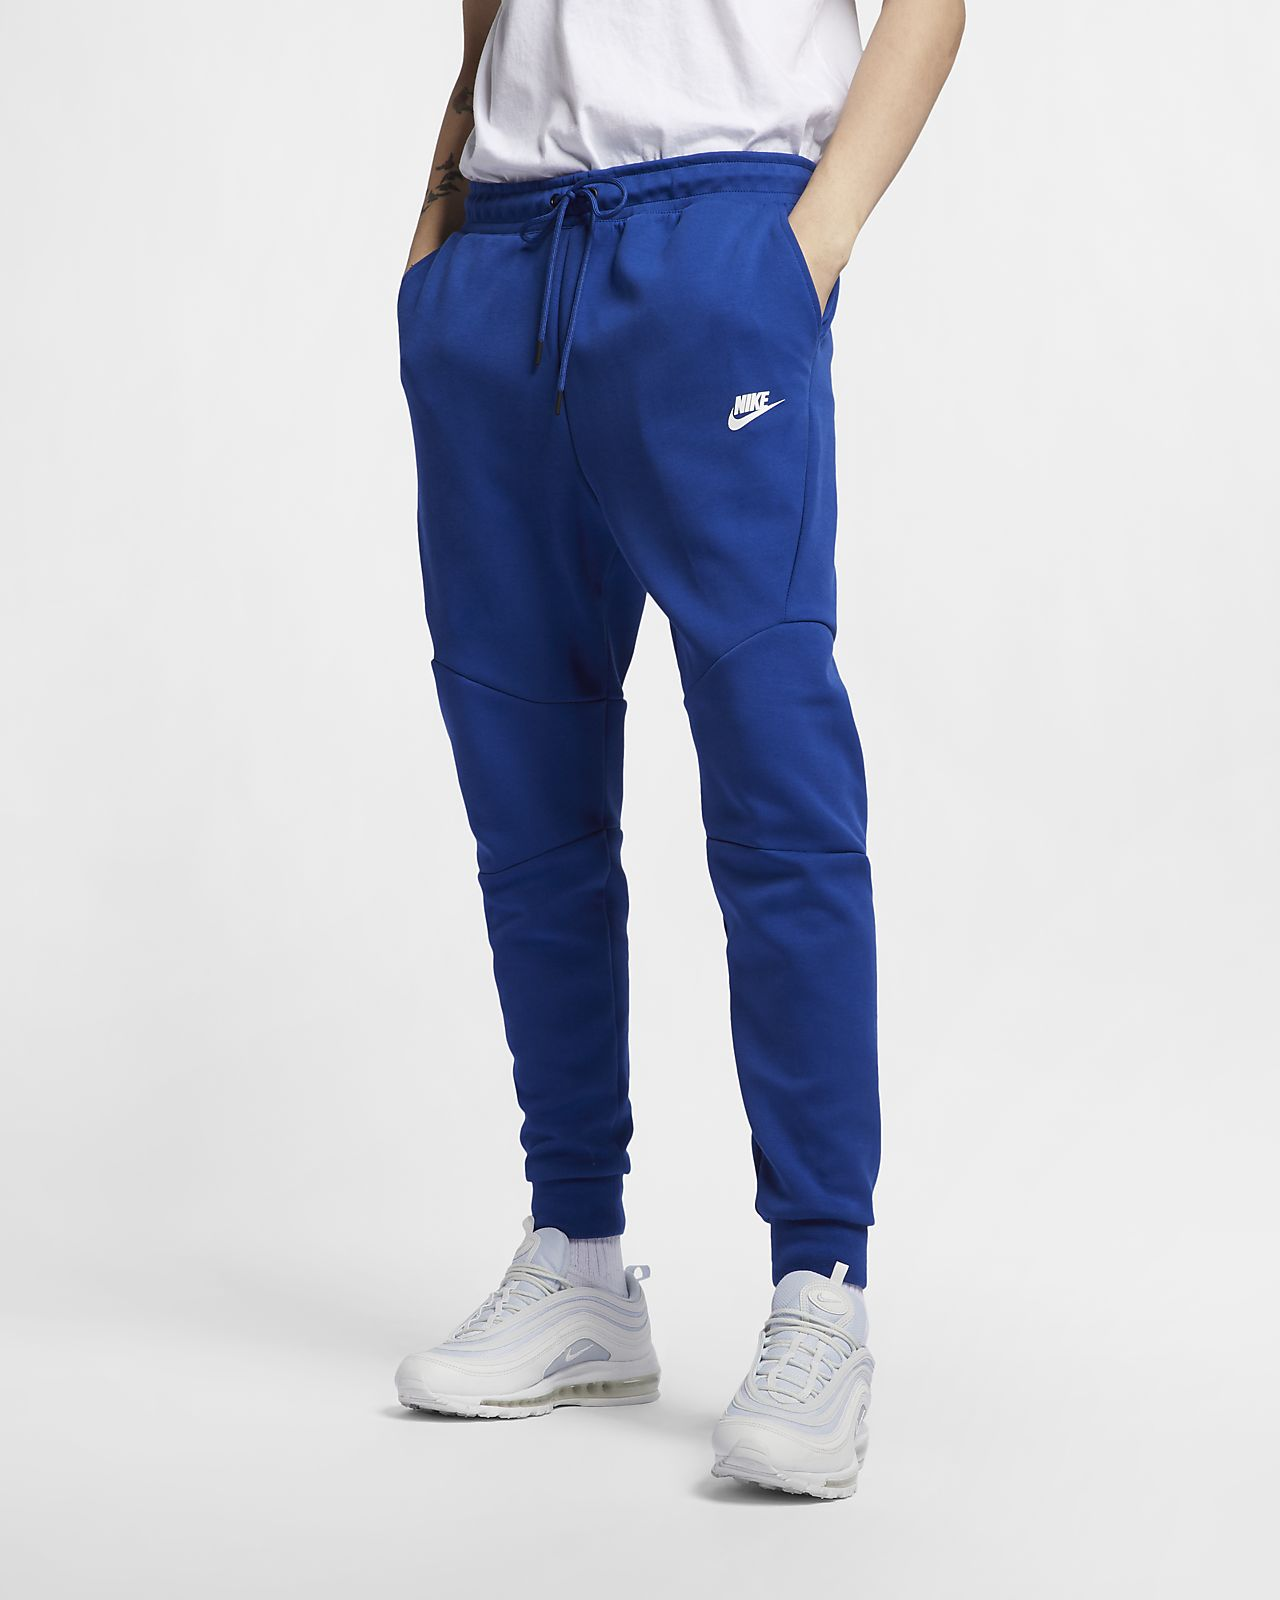 premium selection 861dc cad21 Low Resolution Jogger Nike Sportswear Tech Fleece - Uomo Jogger Nike  Sportswear Tech Fleece - Uomo